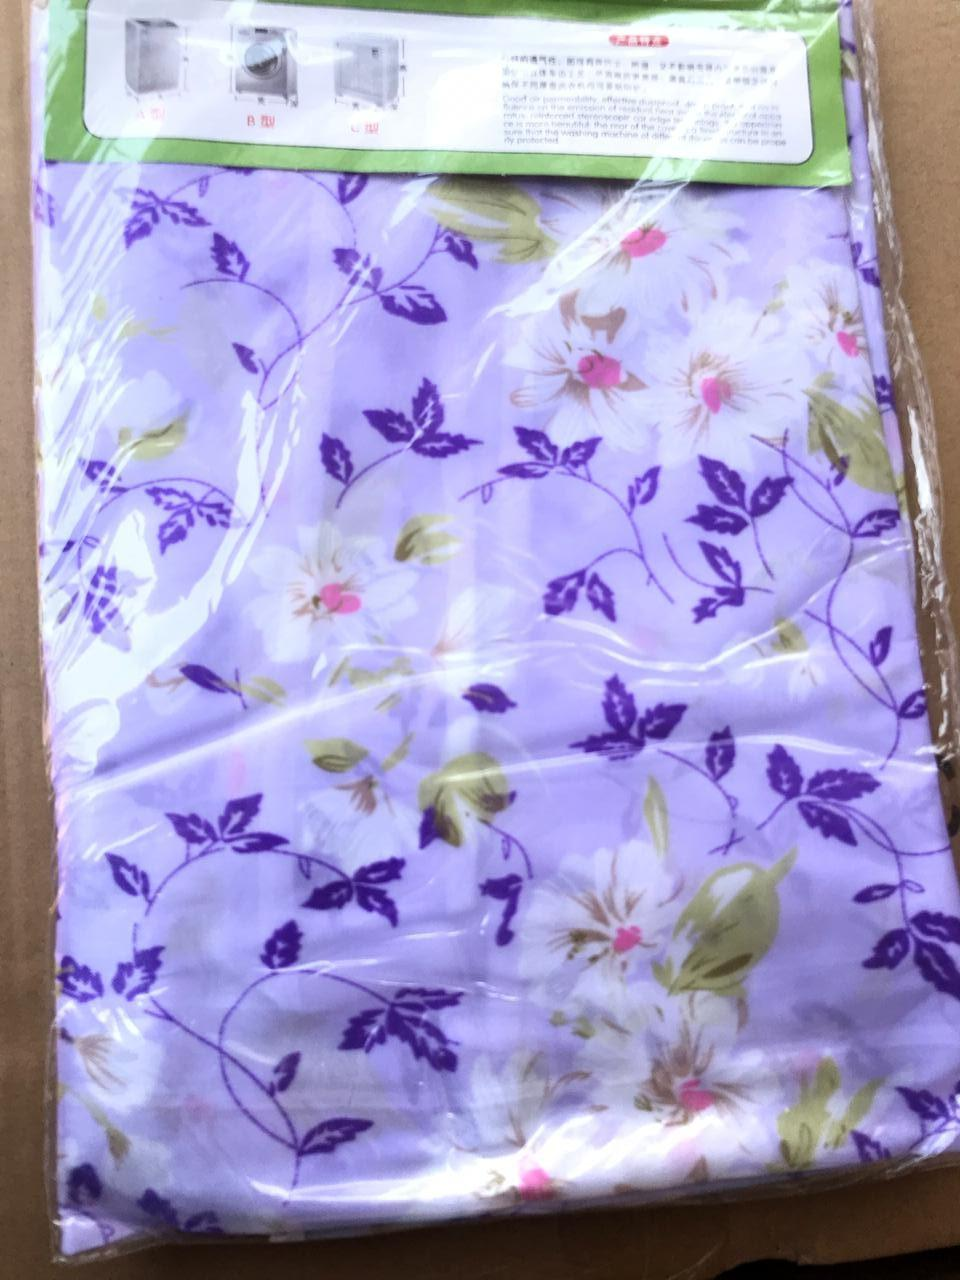 Kain Penutup Cover Furnitur Cotton Floral Headboard Tutup Sandaran Springbed